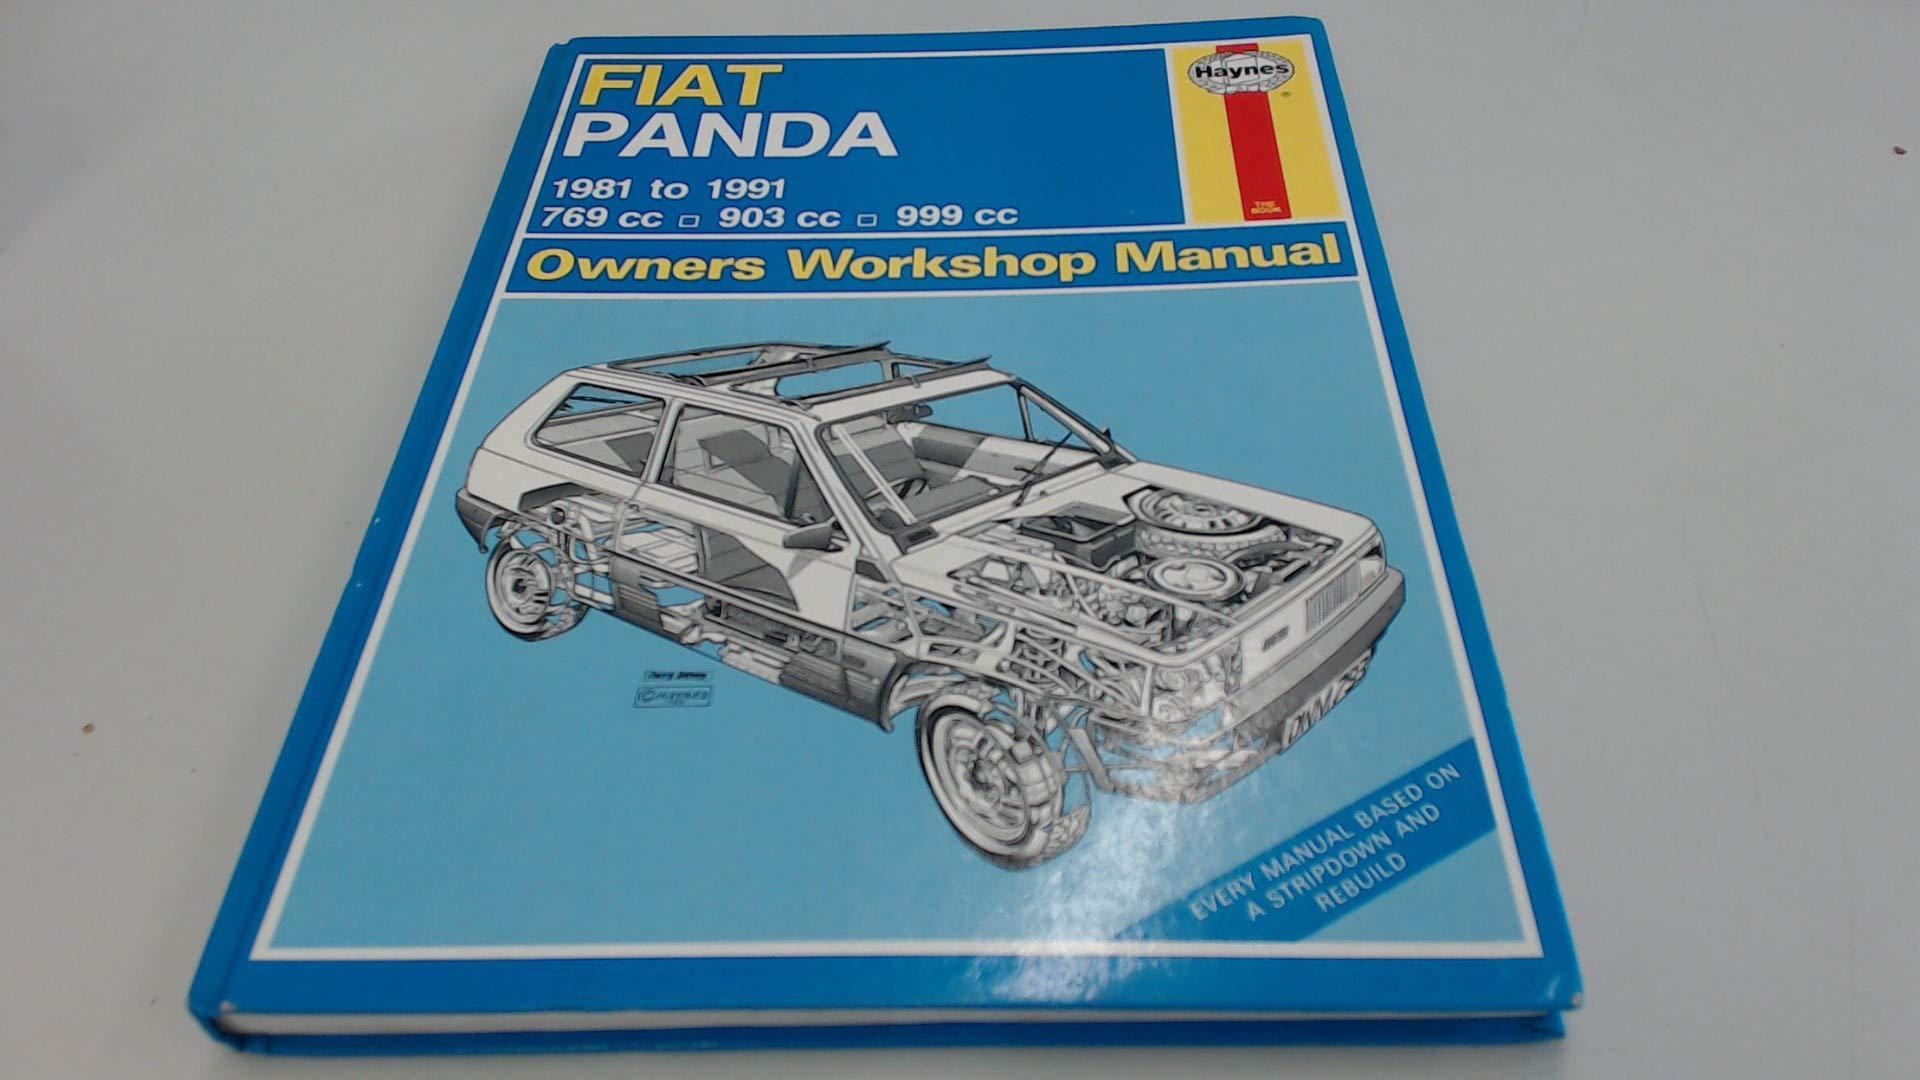 Fiat Panda 1981-91 Owner's Workshop Manual: Peter G. Strasman:  9781850105169: Amazon.com: Books